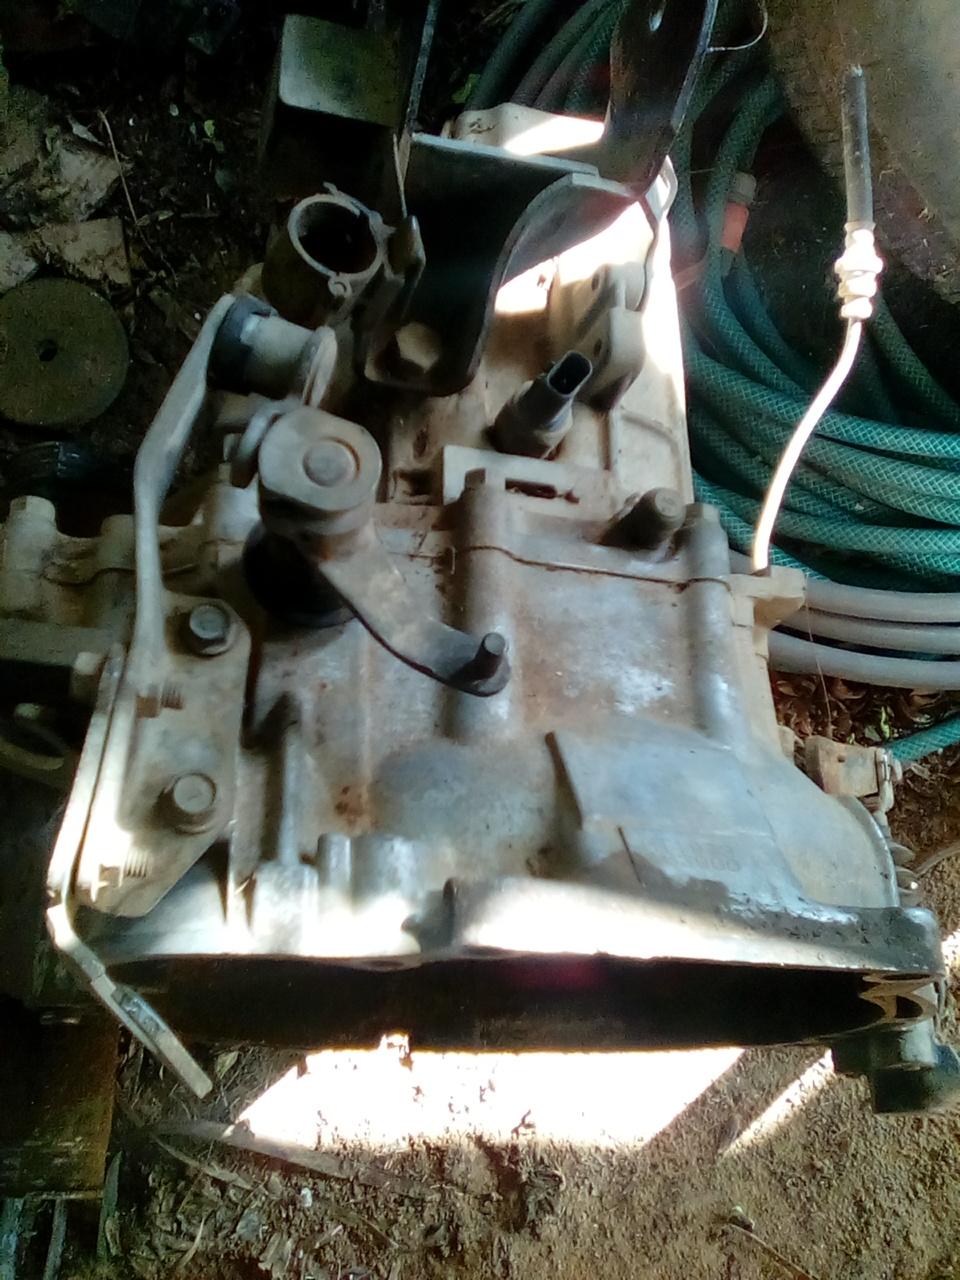 Hyundai gearbox